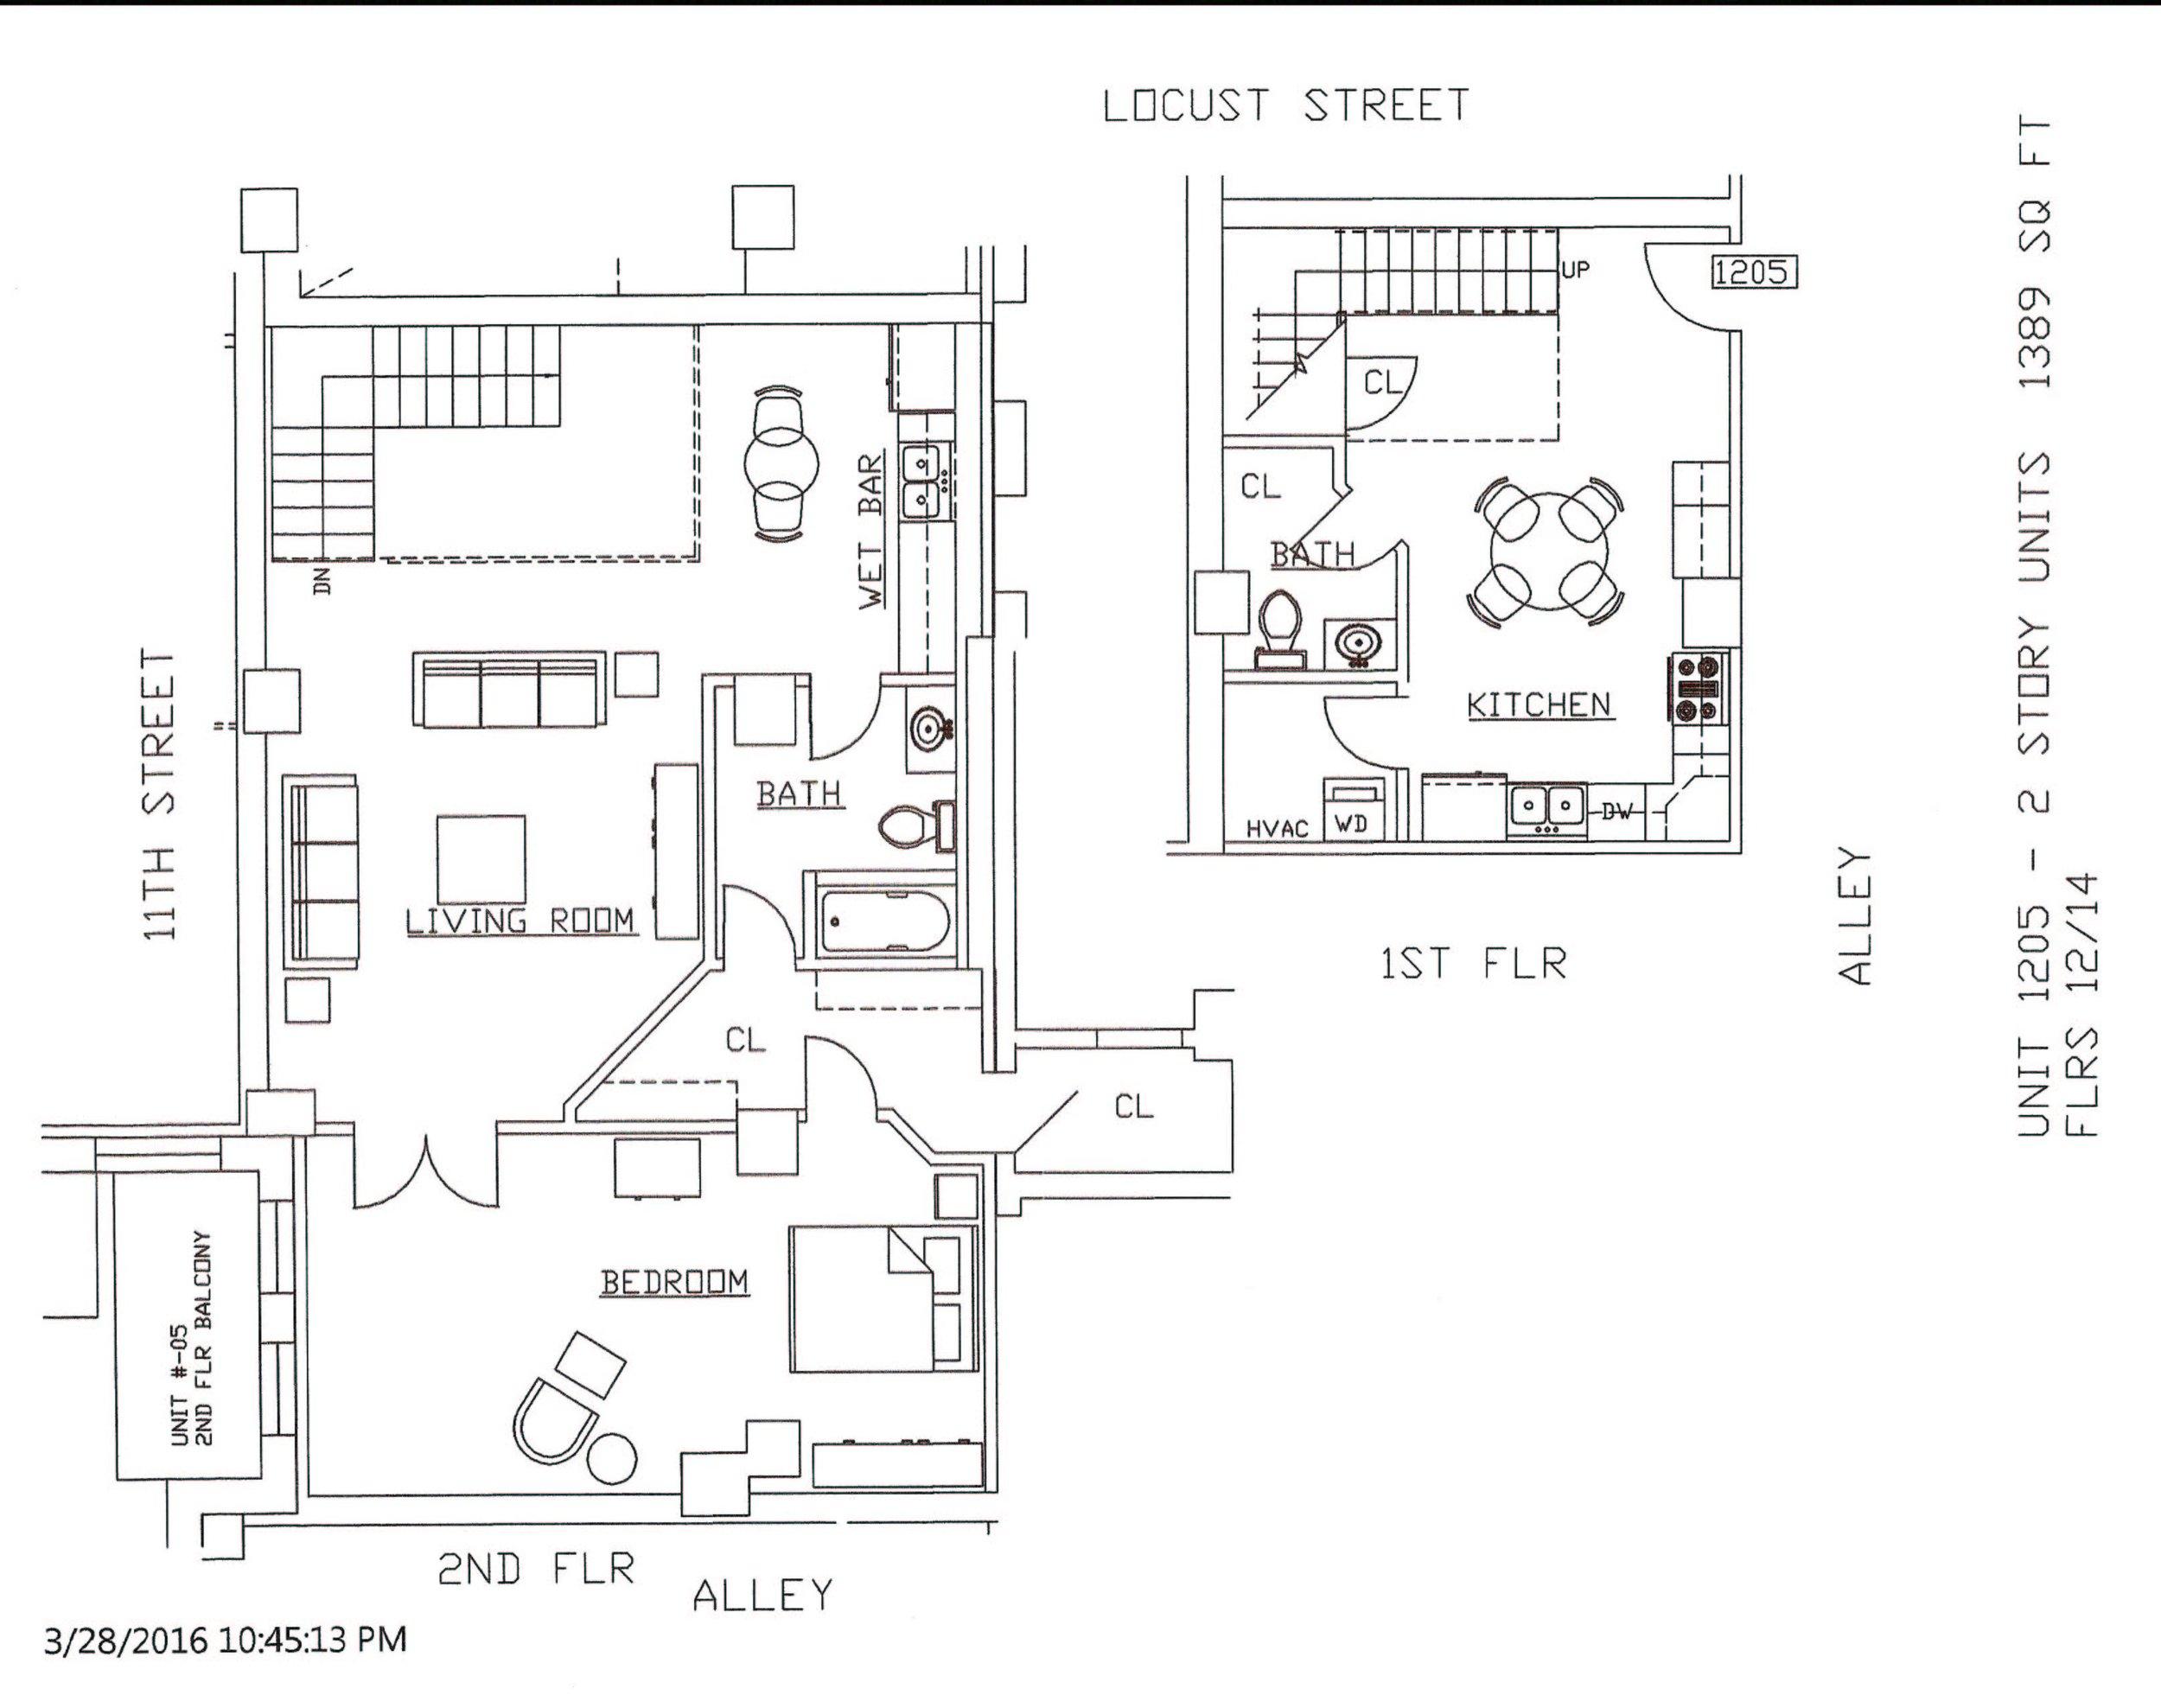 Unit 1205, 1389 Square Feet